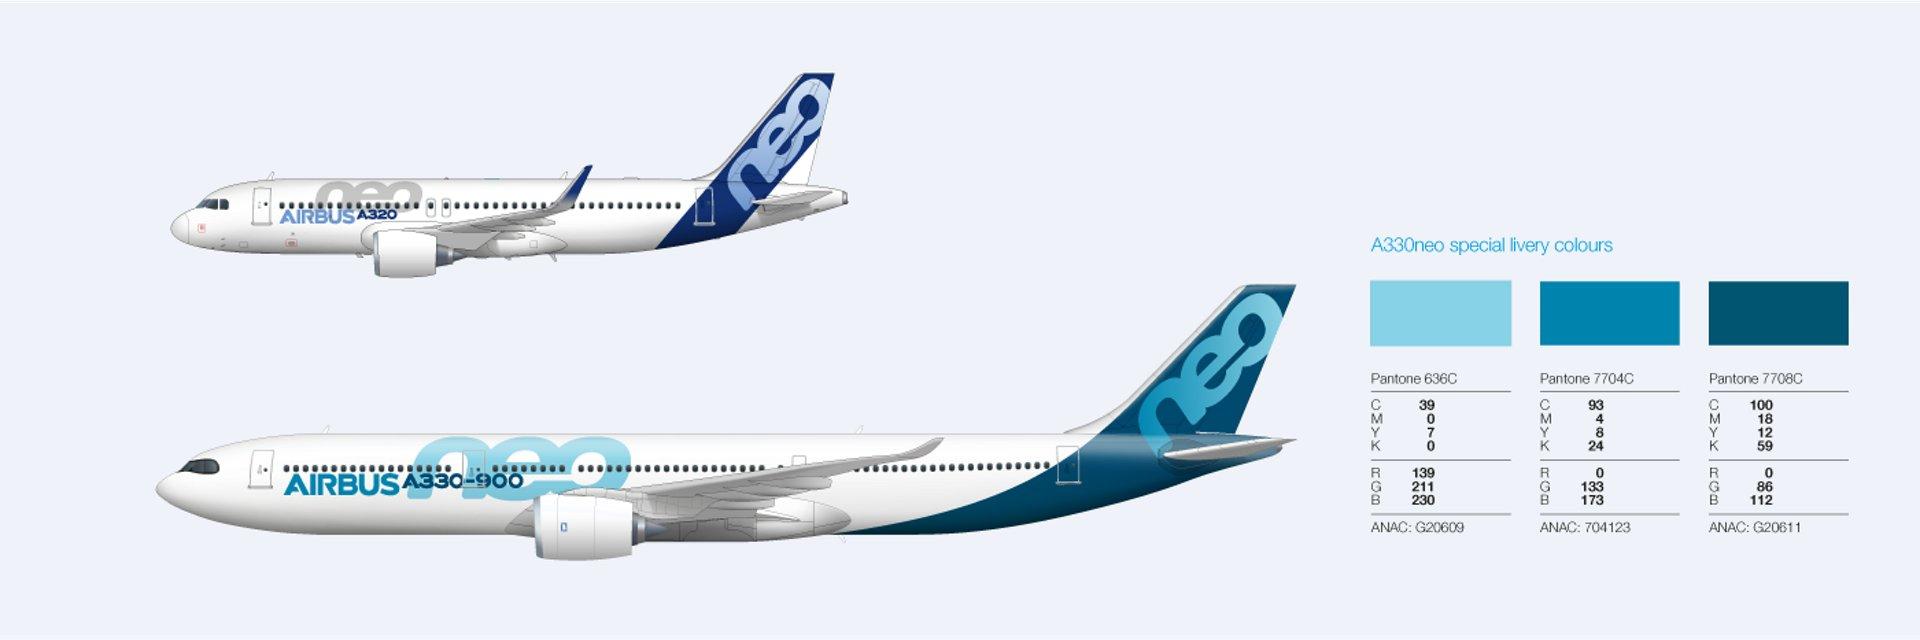 Aircraft Livery Neo